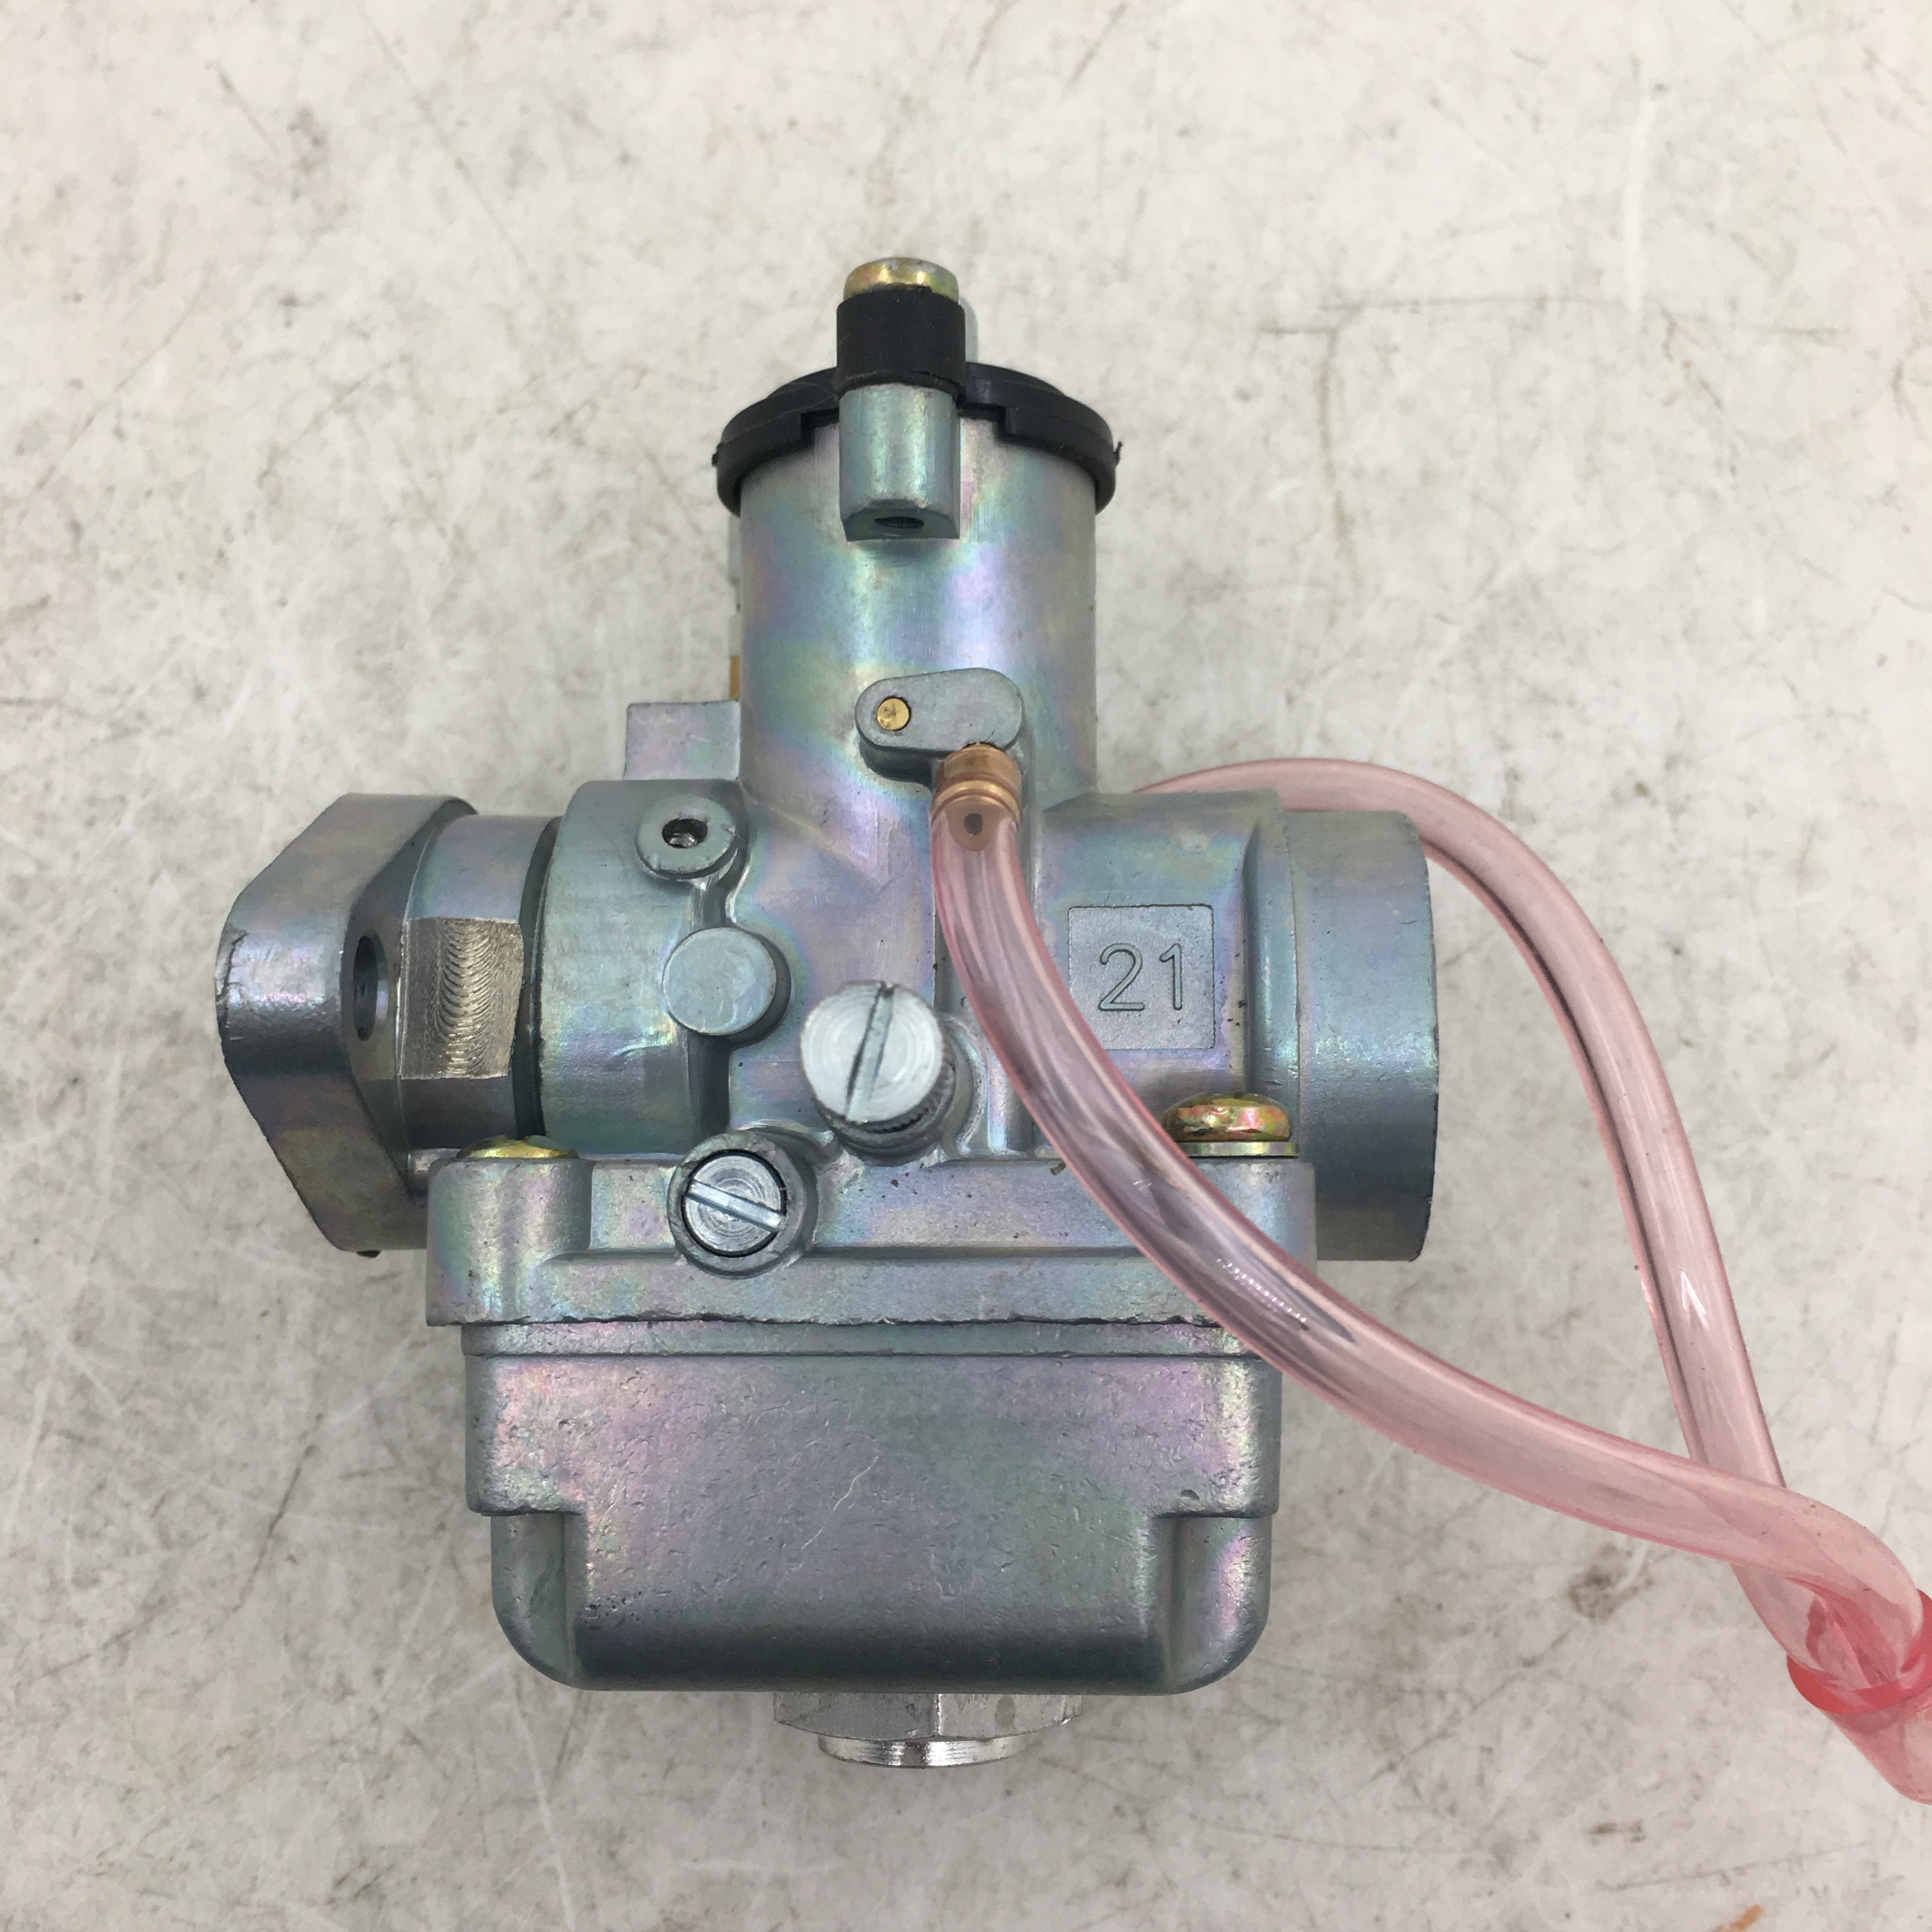 SherryBerg Vergaser carburador 21MM AM 21T para Simson S50 S51 KR51 SR50 AMAL réplica nuevo carburador completo carbono vergaser